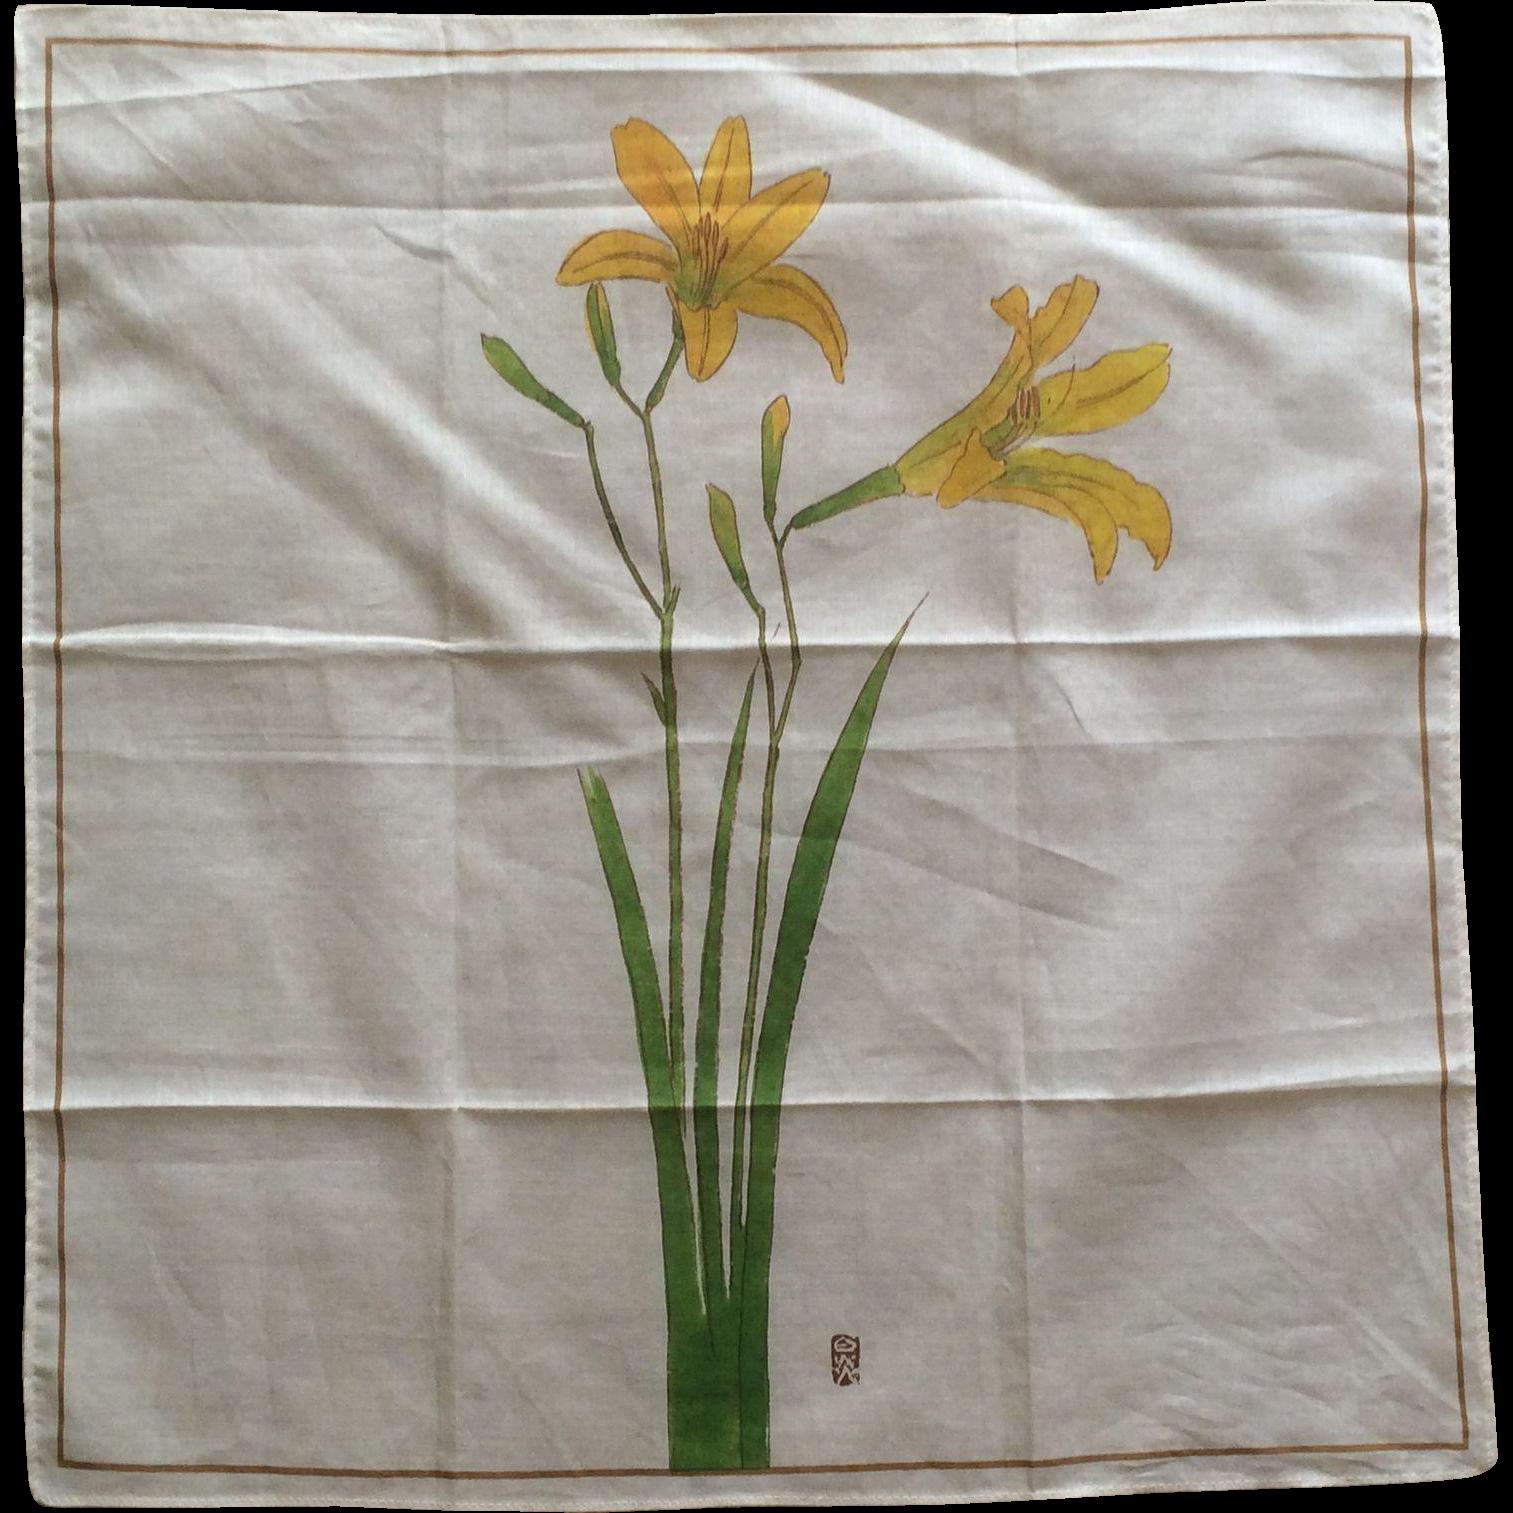 Vintage Japanese cotton handkerchief lilly design